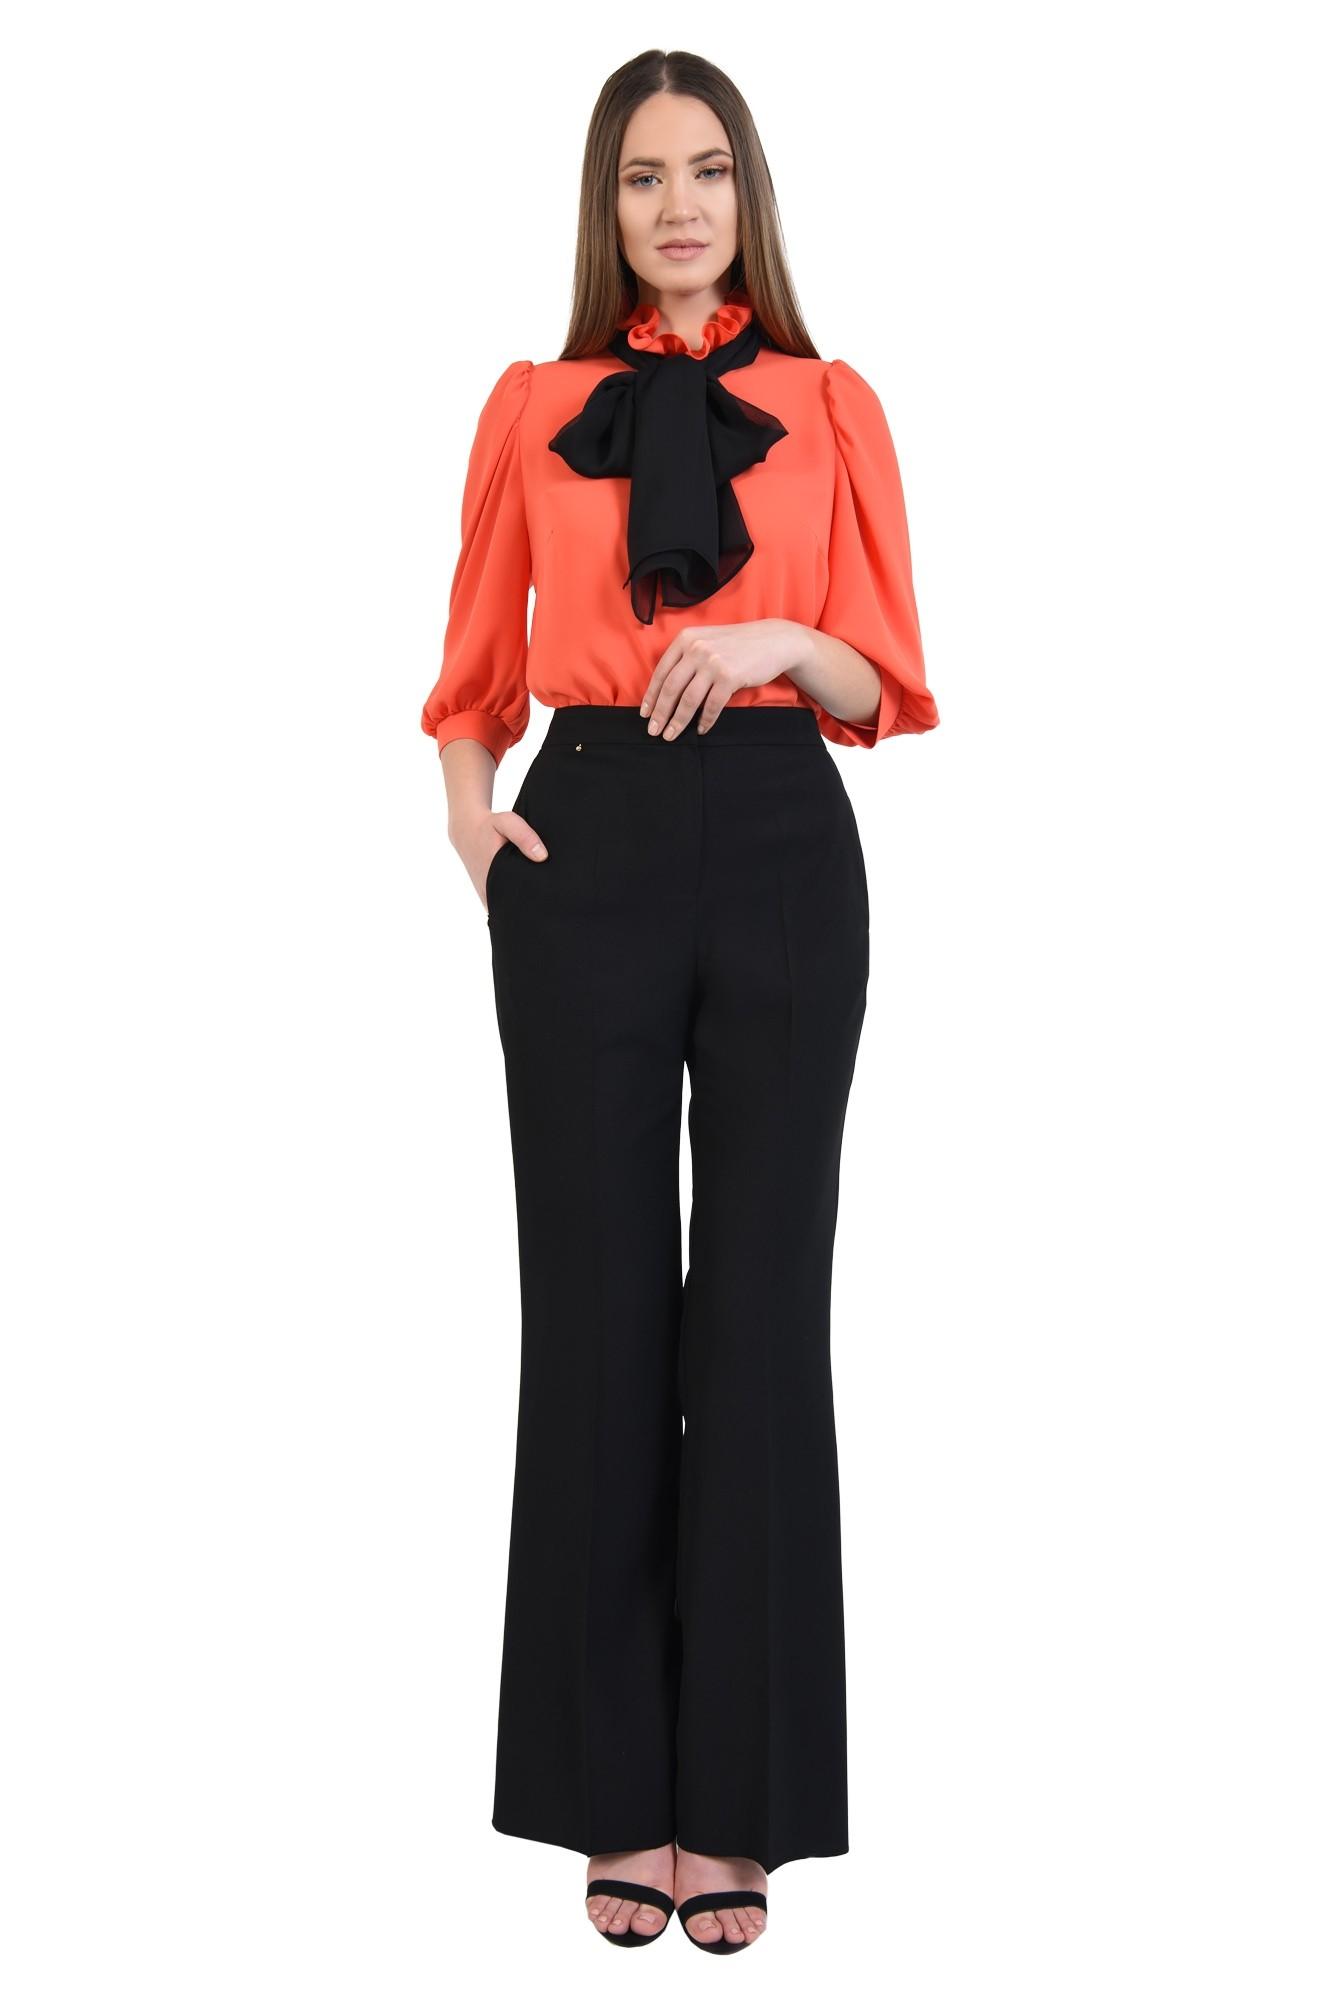 3 - 360 - bluza eleganta, maneci 3/4 cu mansete, funda neagra, bluza din sifon